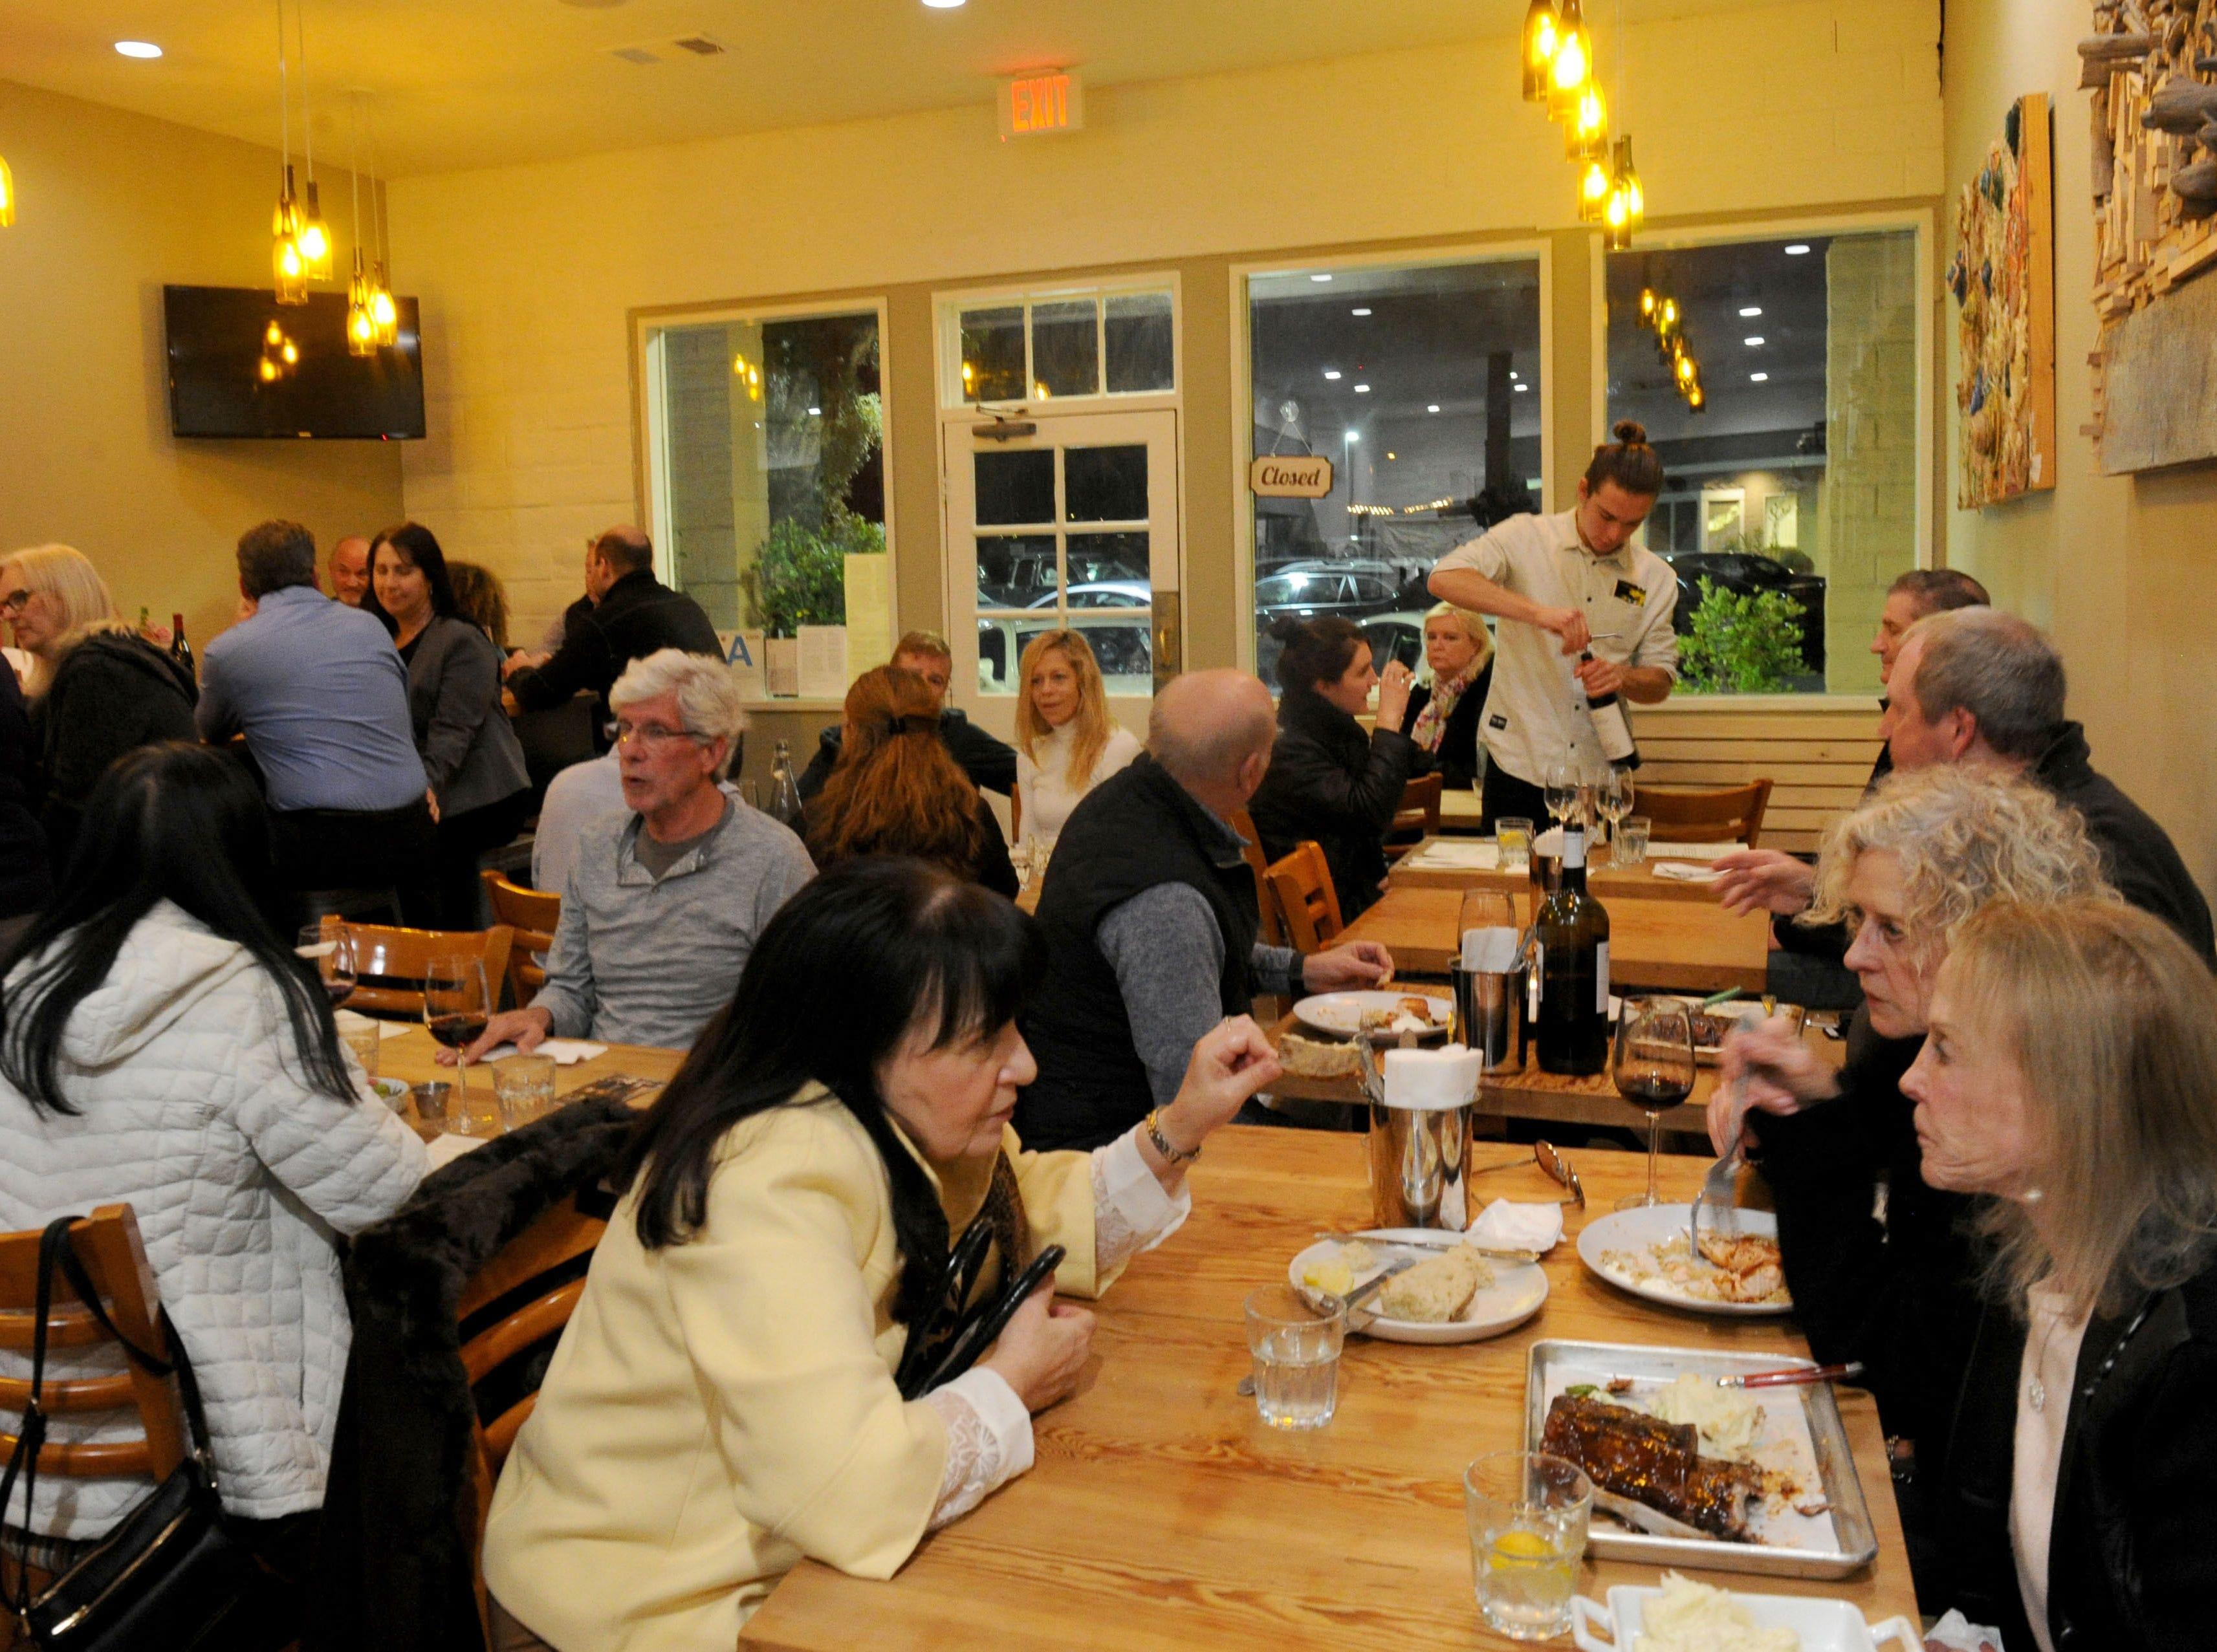 A packed house dines at Decker Kitchen in Westlake Village.